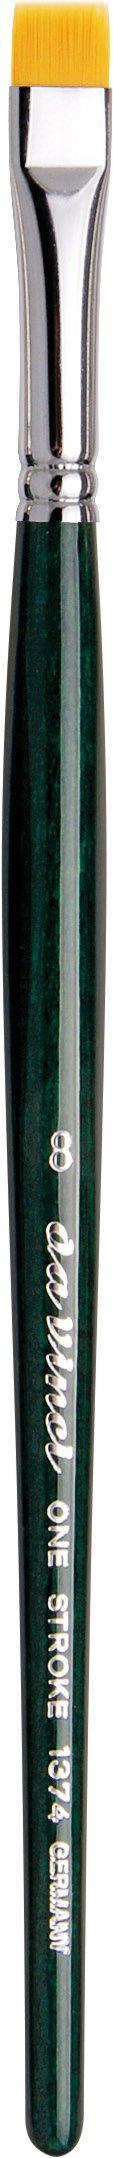 da Vinci Nova Series 1374 One Stroke Brush, One Stroke Short Flat Synthetic, Size 8 by da Vinci Brushes